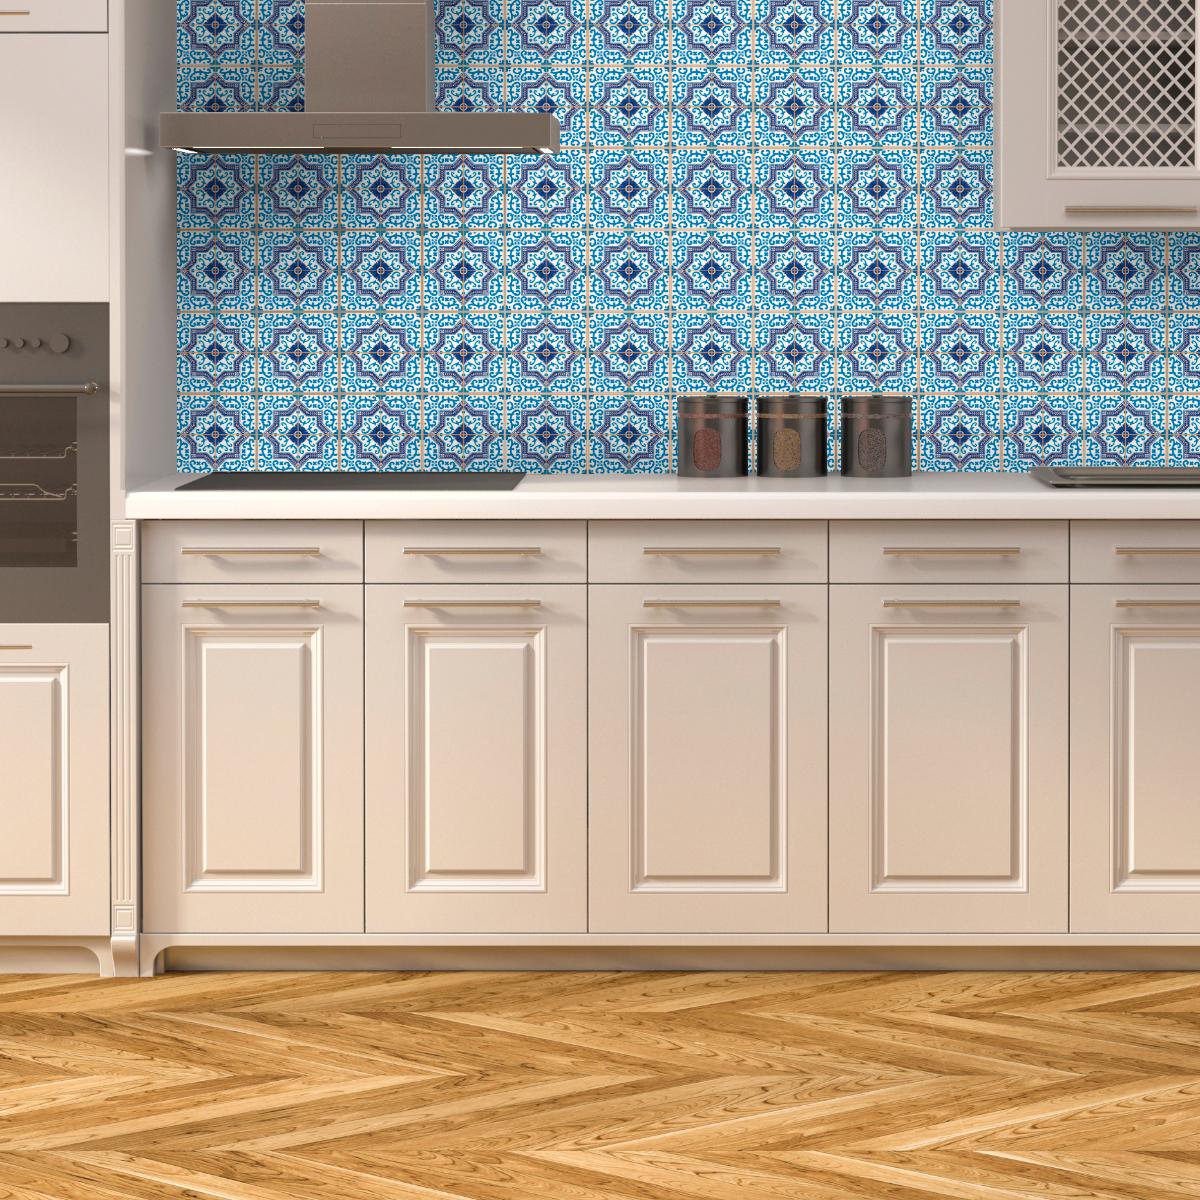 60 stickers carreaux de ciment azulejos romero salle de. Black Bedroom Furniture Sets. Home Design Ideas